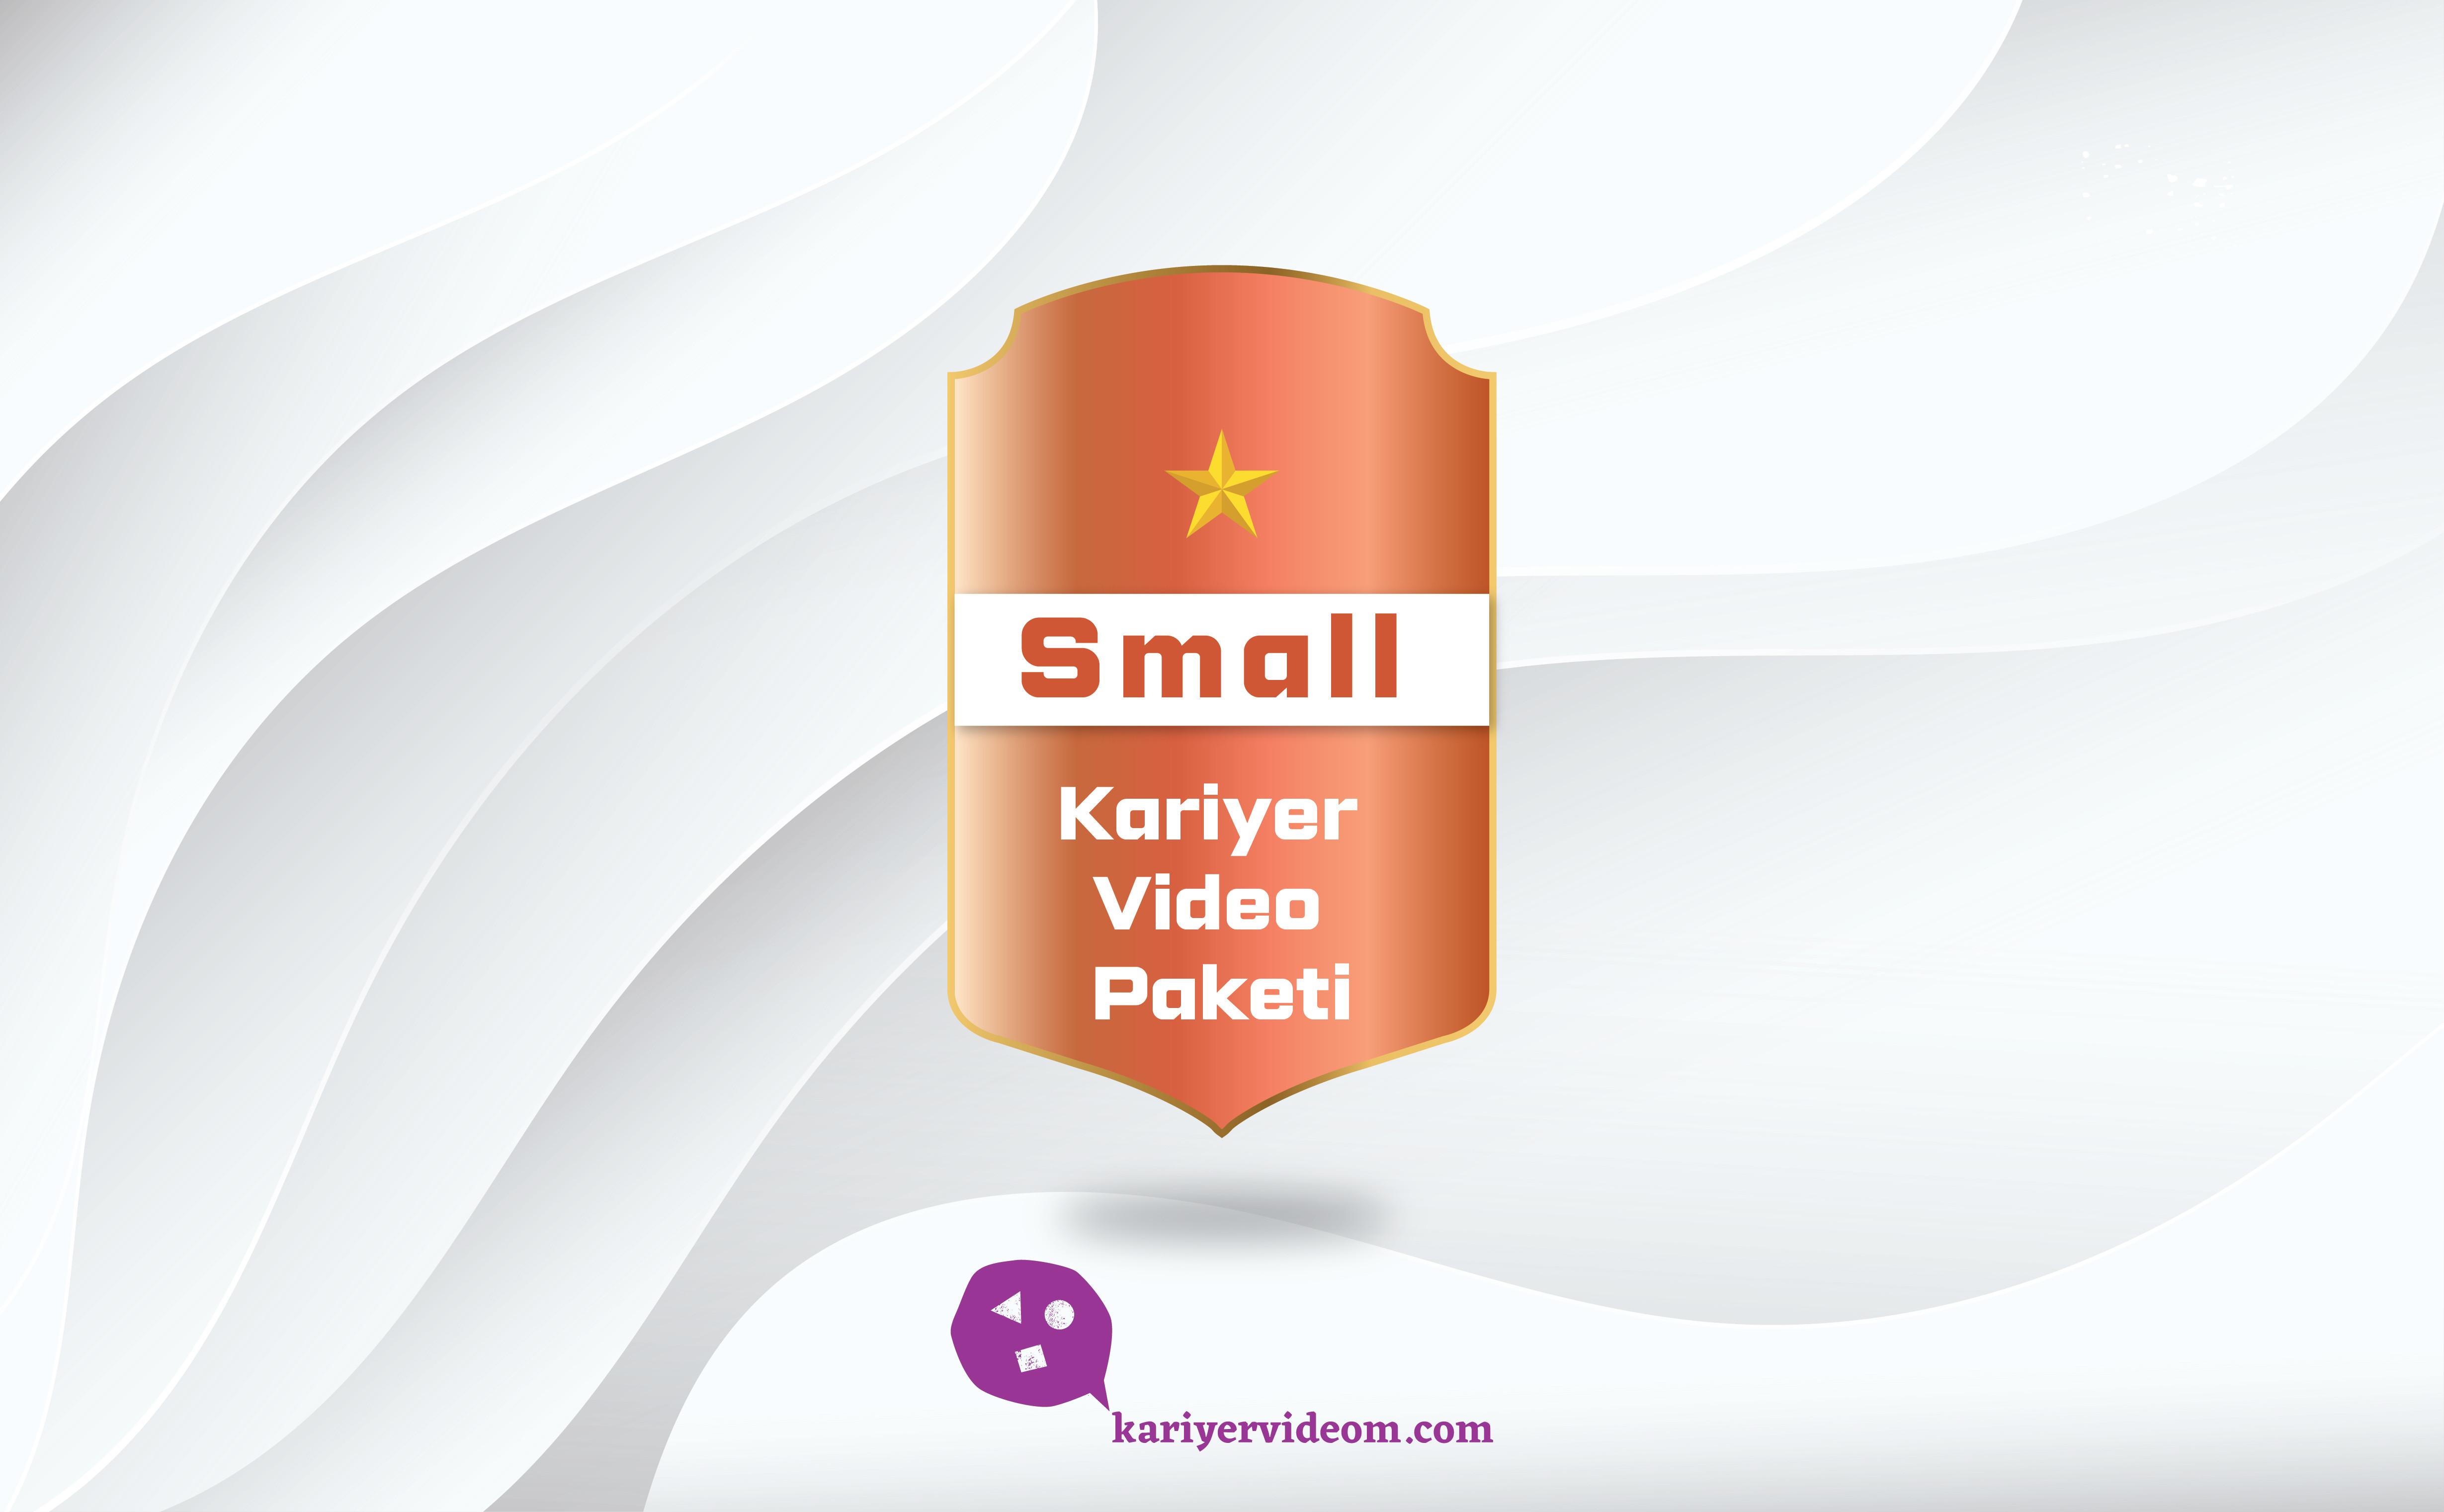 Small Kariyer Videom Paketi